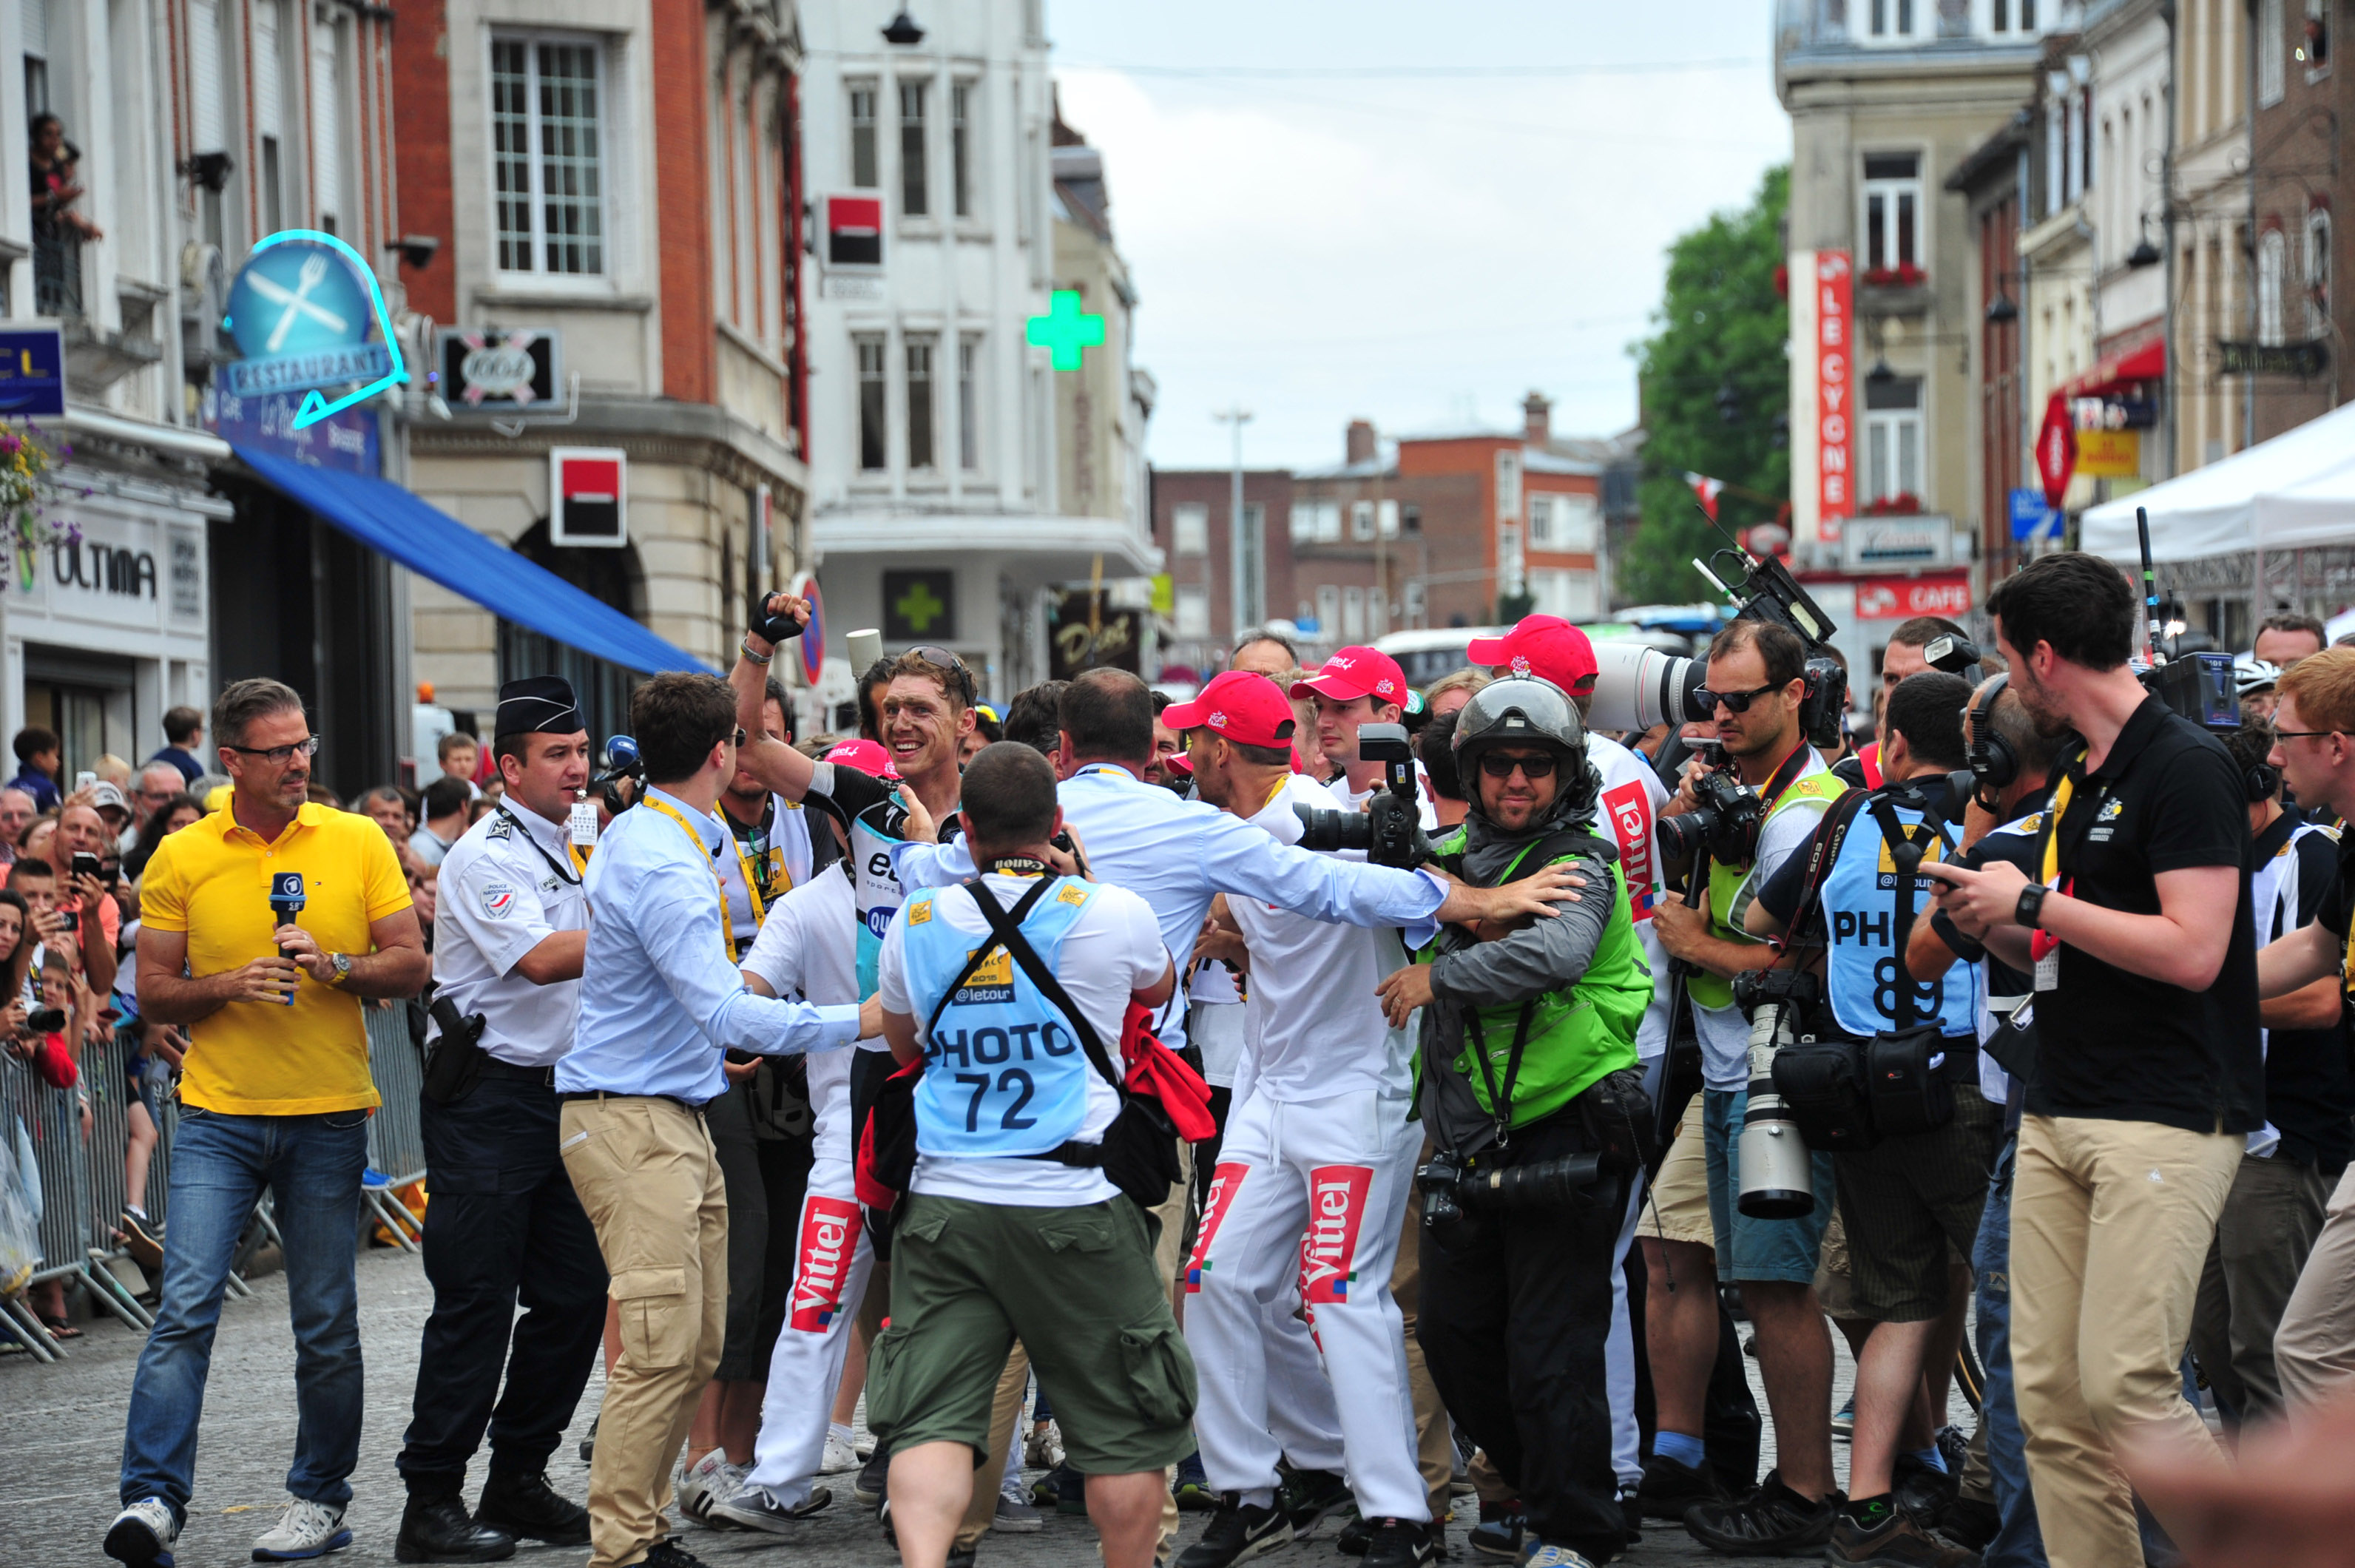 Umjubelter Tony Martin nach der 4. Etappe der Tour de France 2015. (pic: Sirotti)